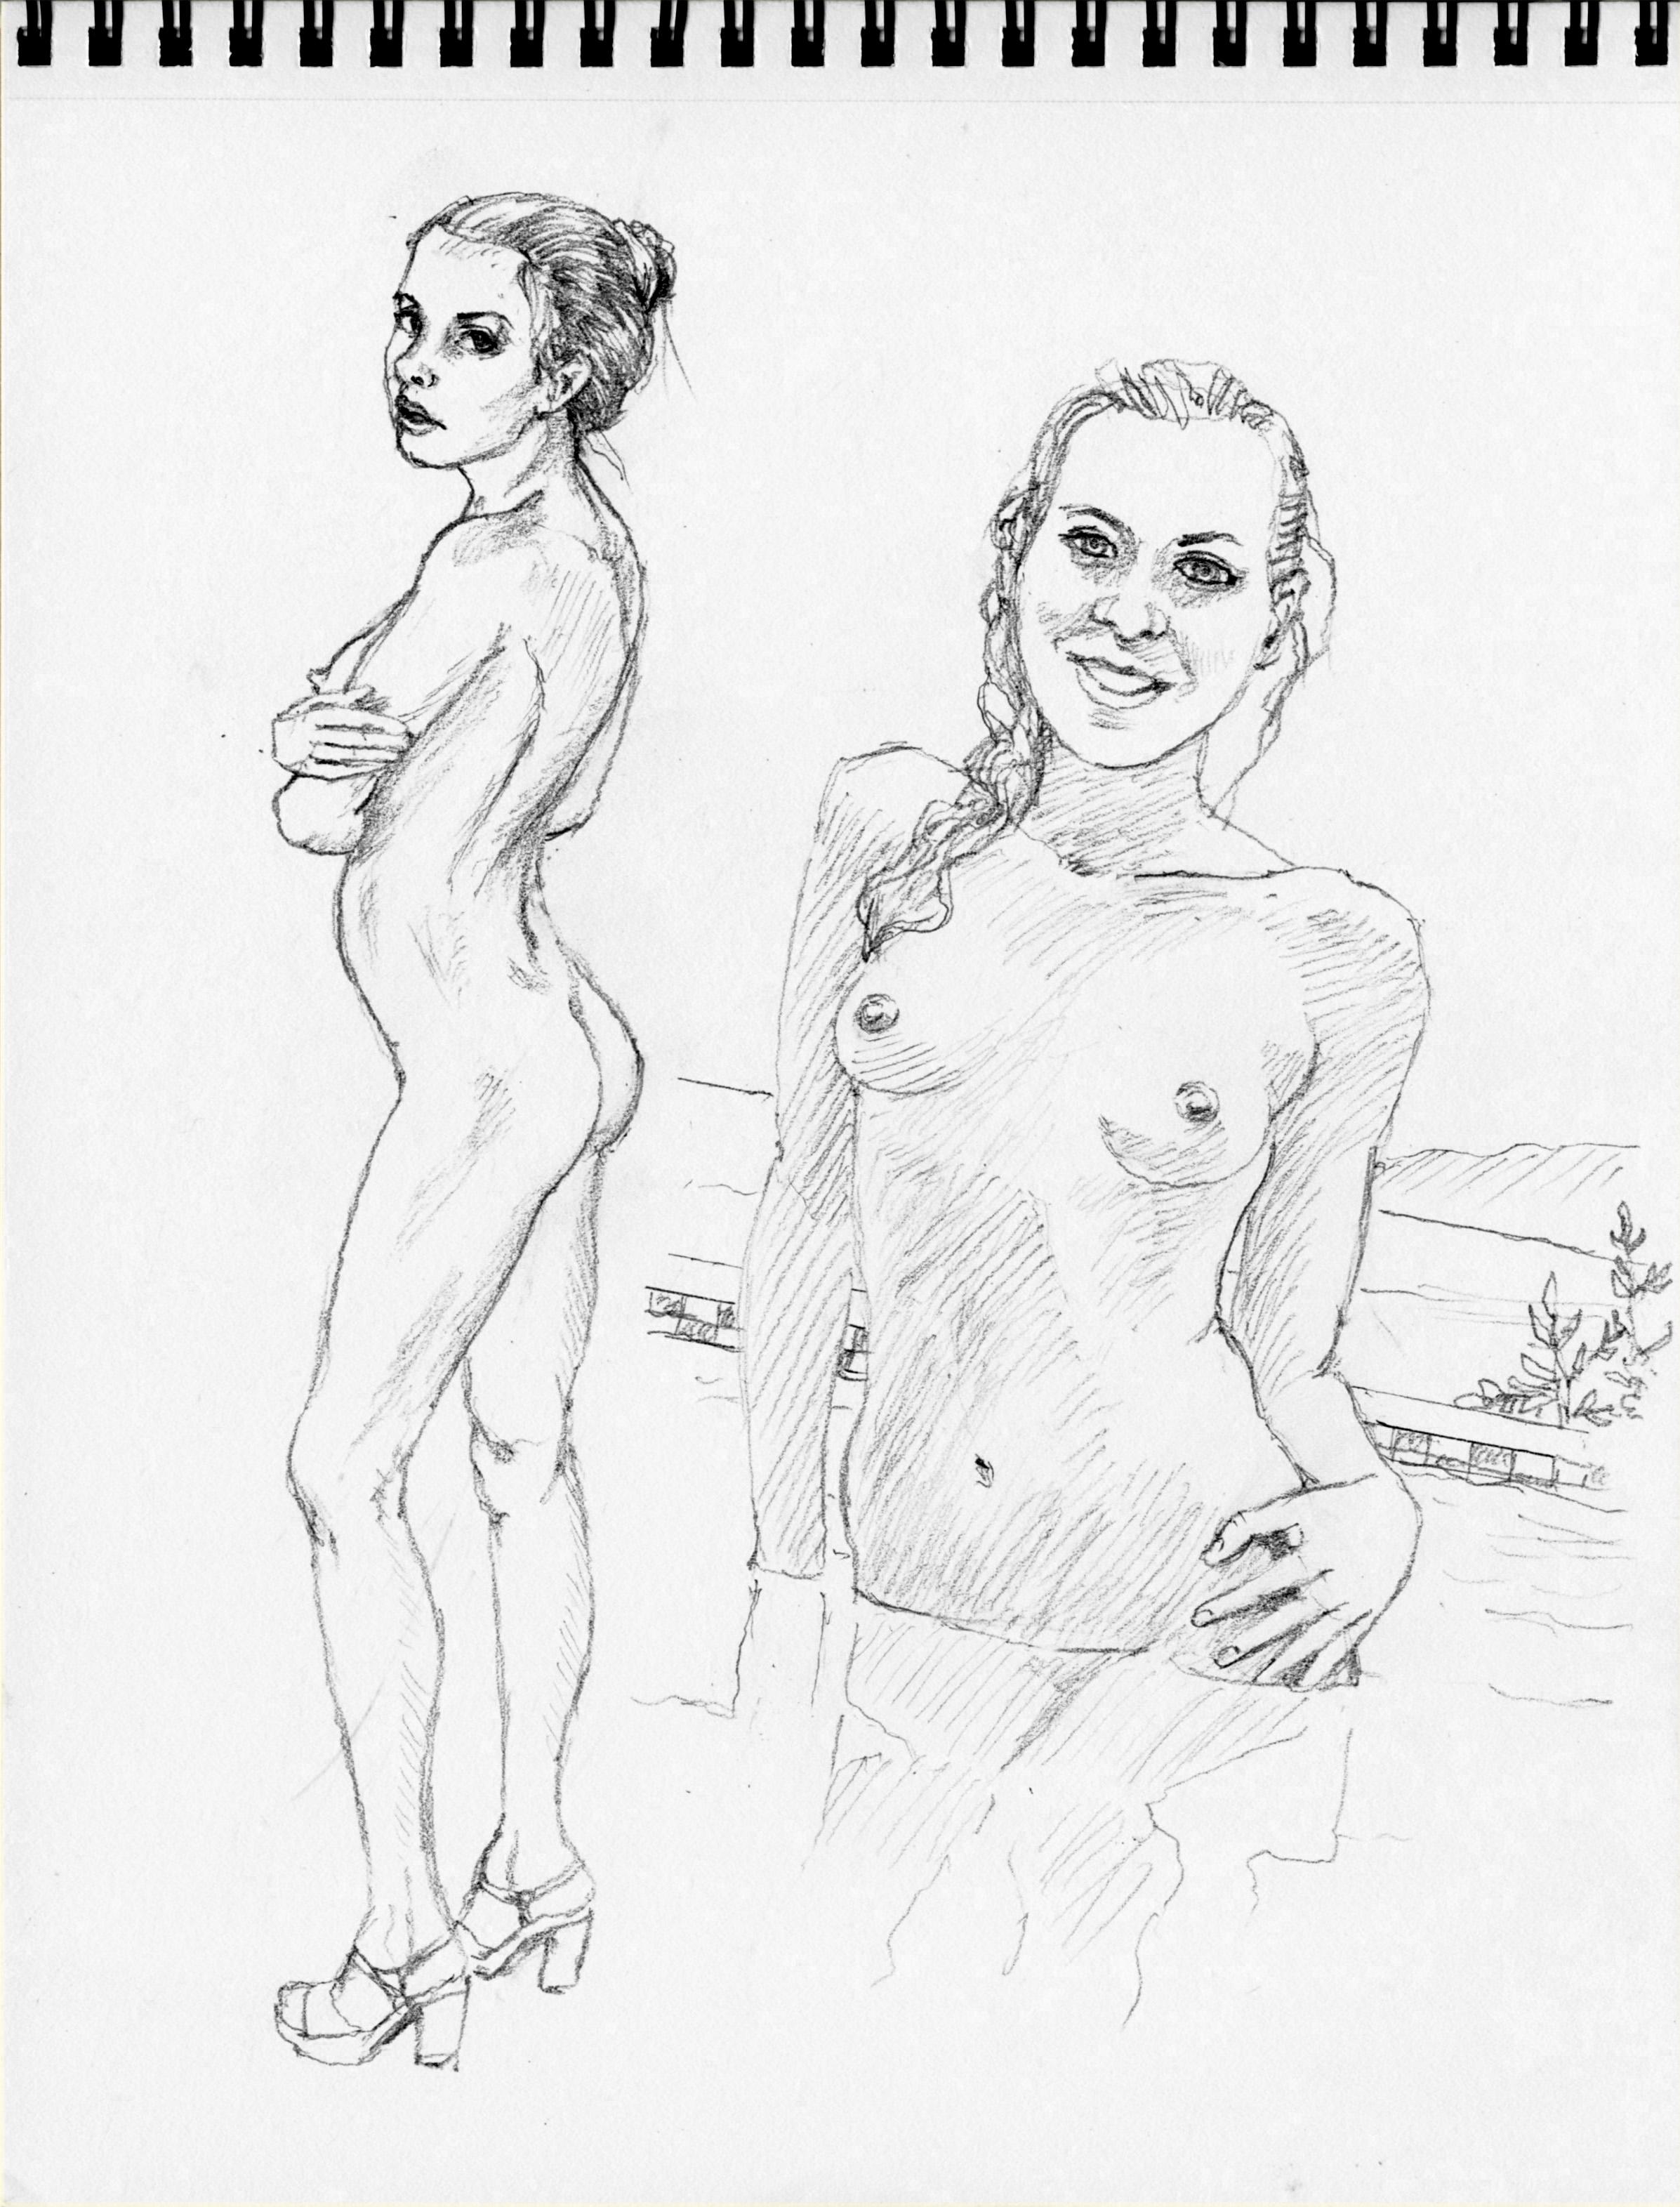 July 2014 sketch441.jpg